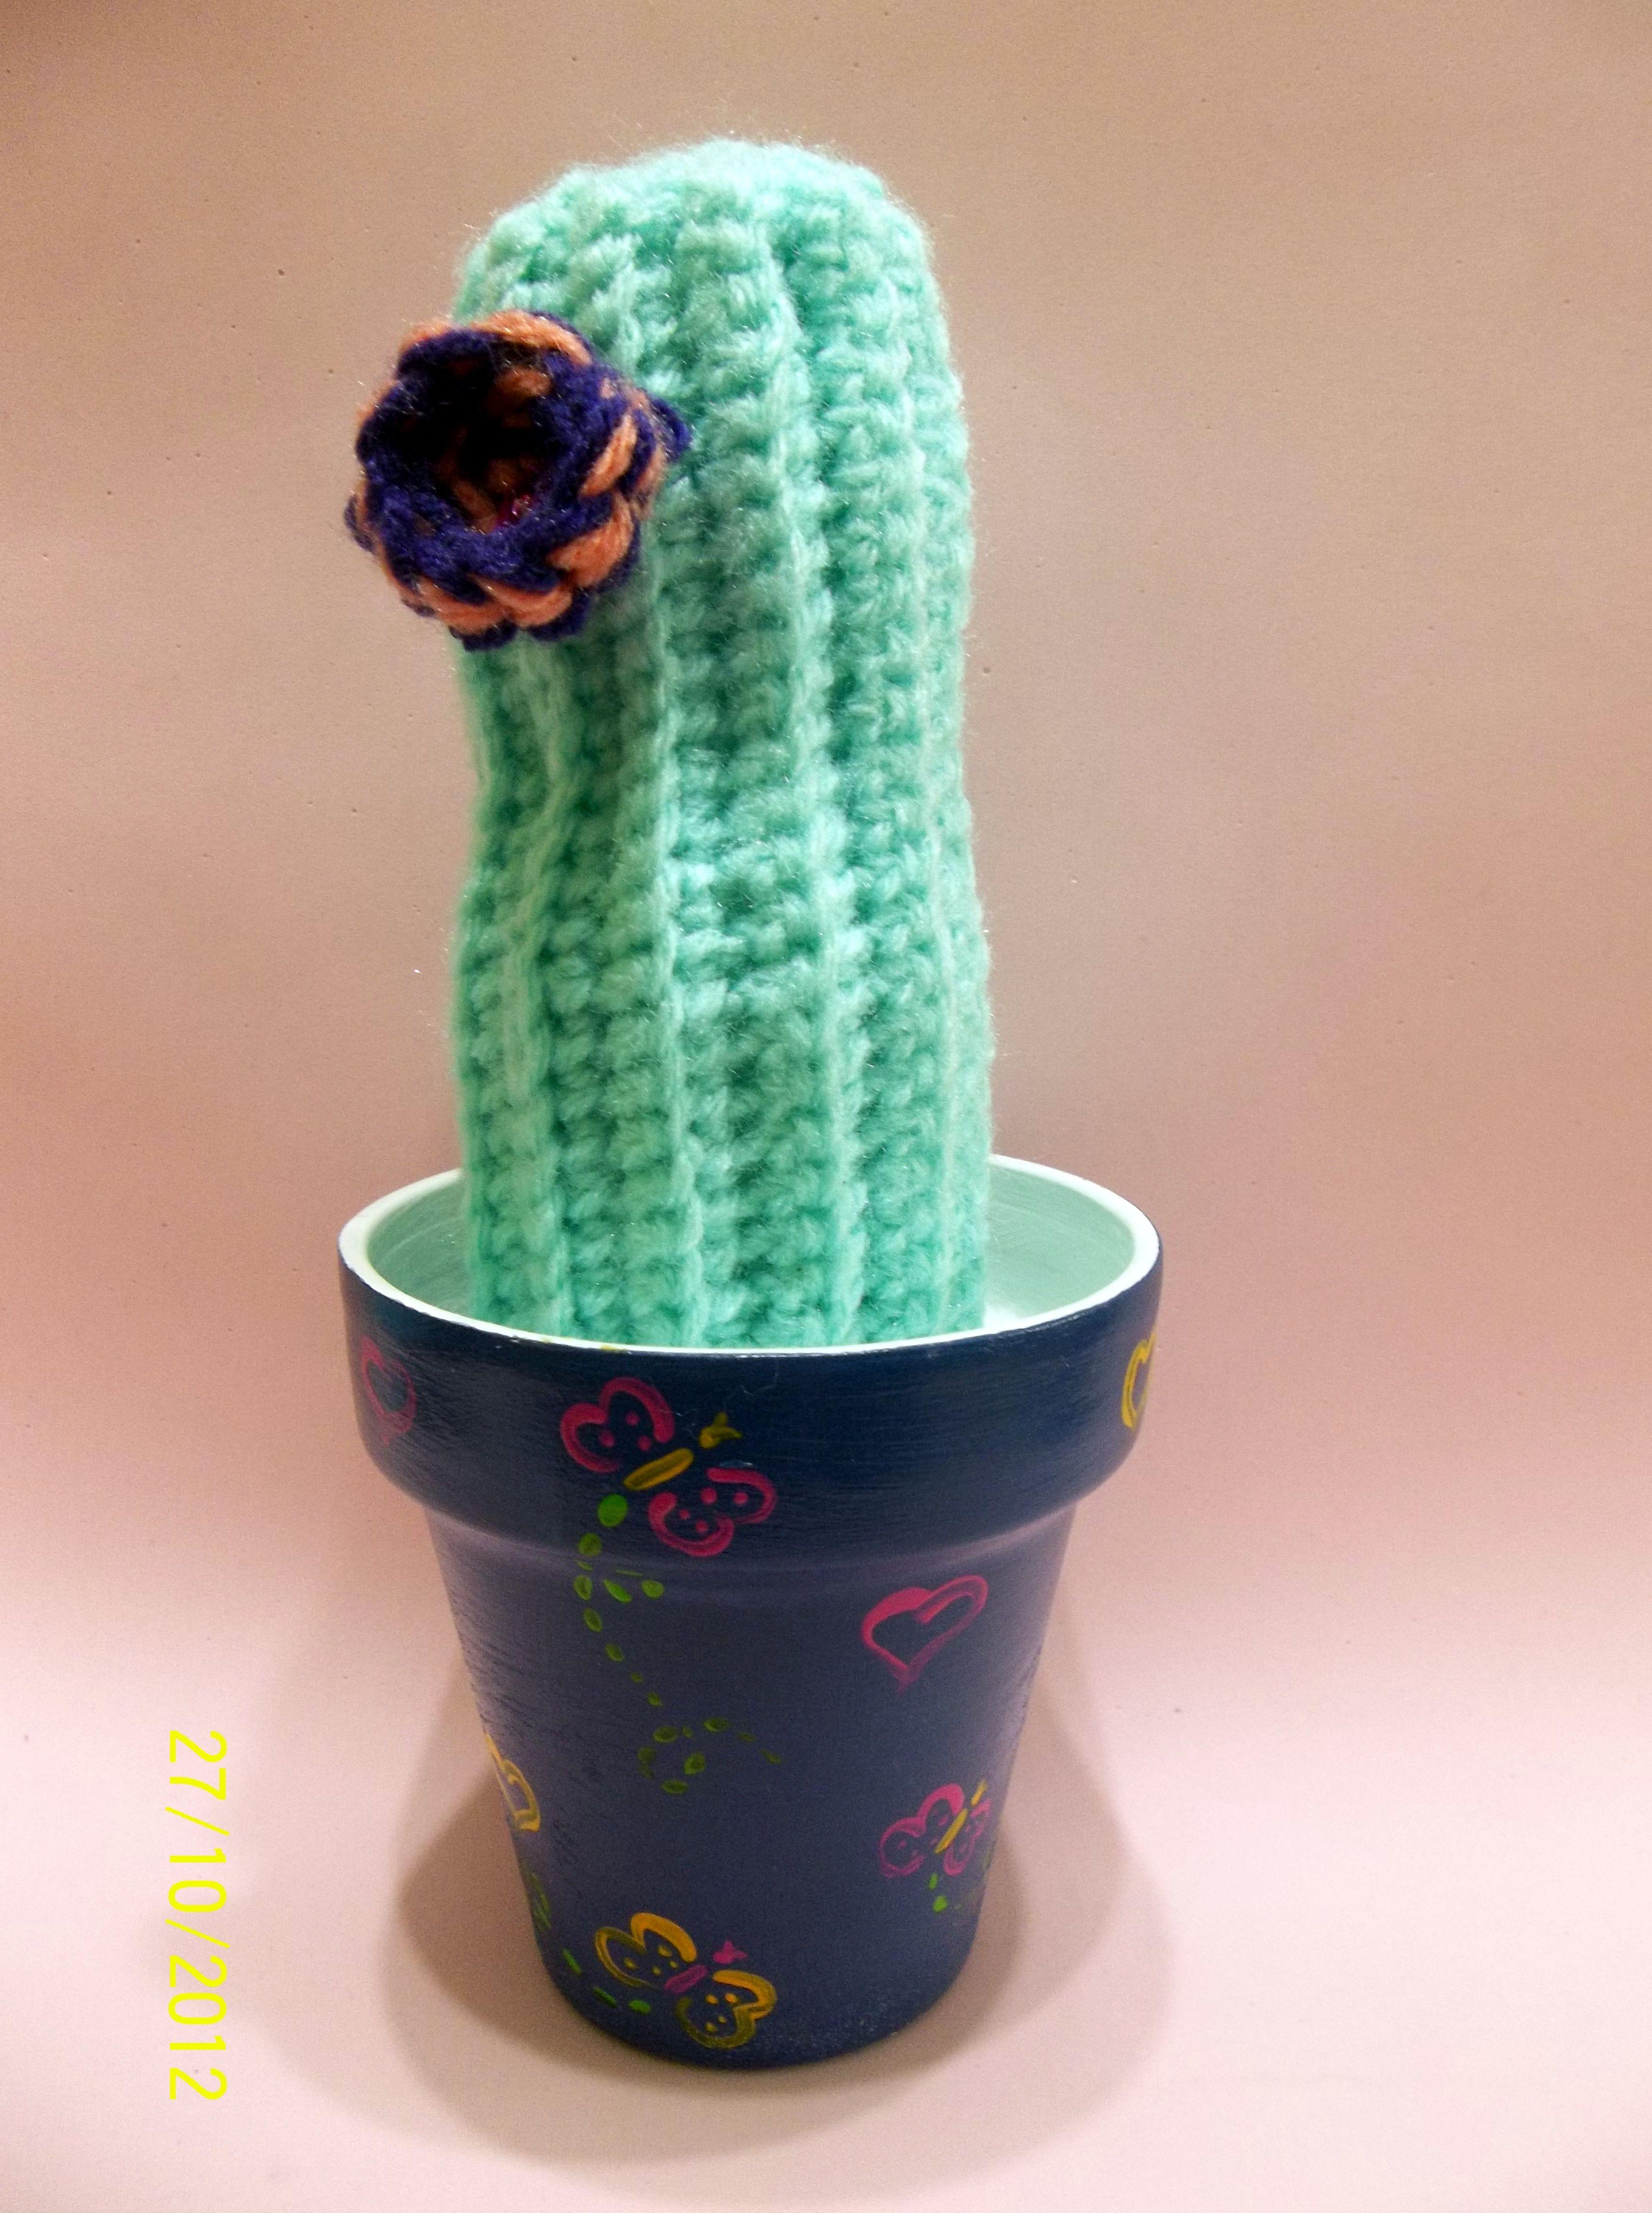 https://www.facebook.com/photo.php?fbid=168879606583711&set=a.168879286583743.40164.157374074400931&type=3&theater Cactus de crochet con maceta intervenida